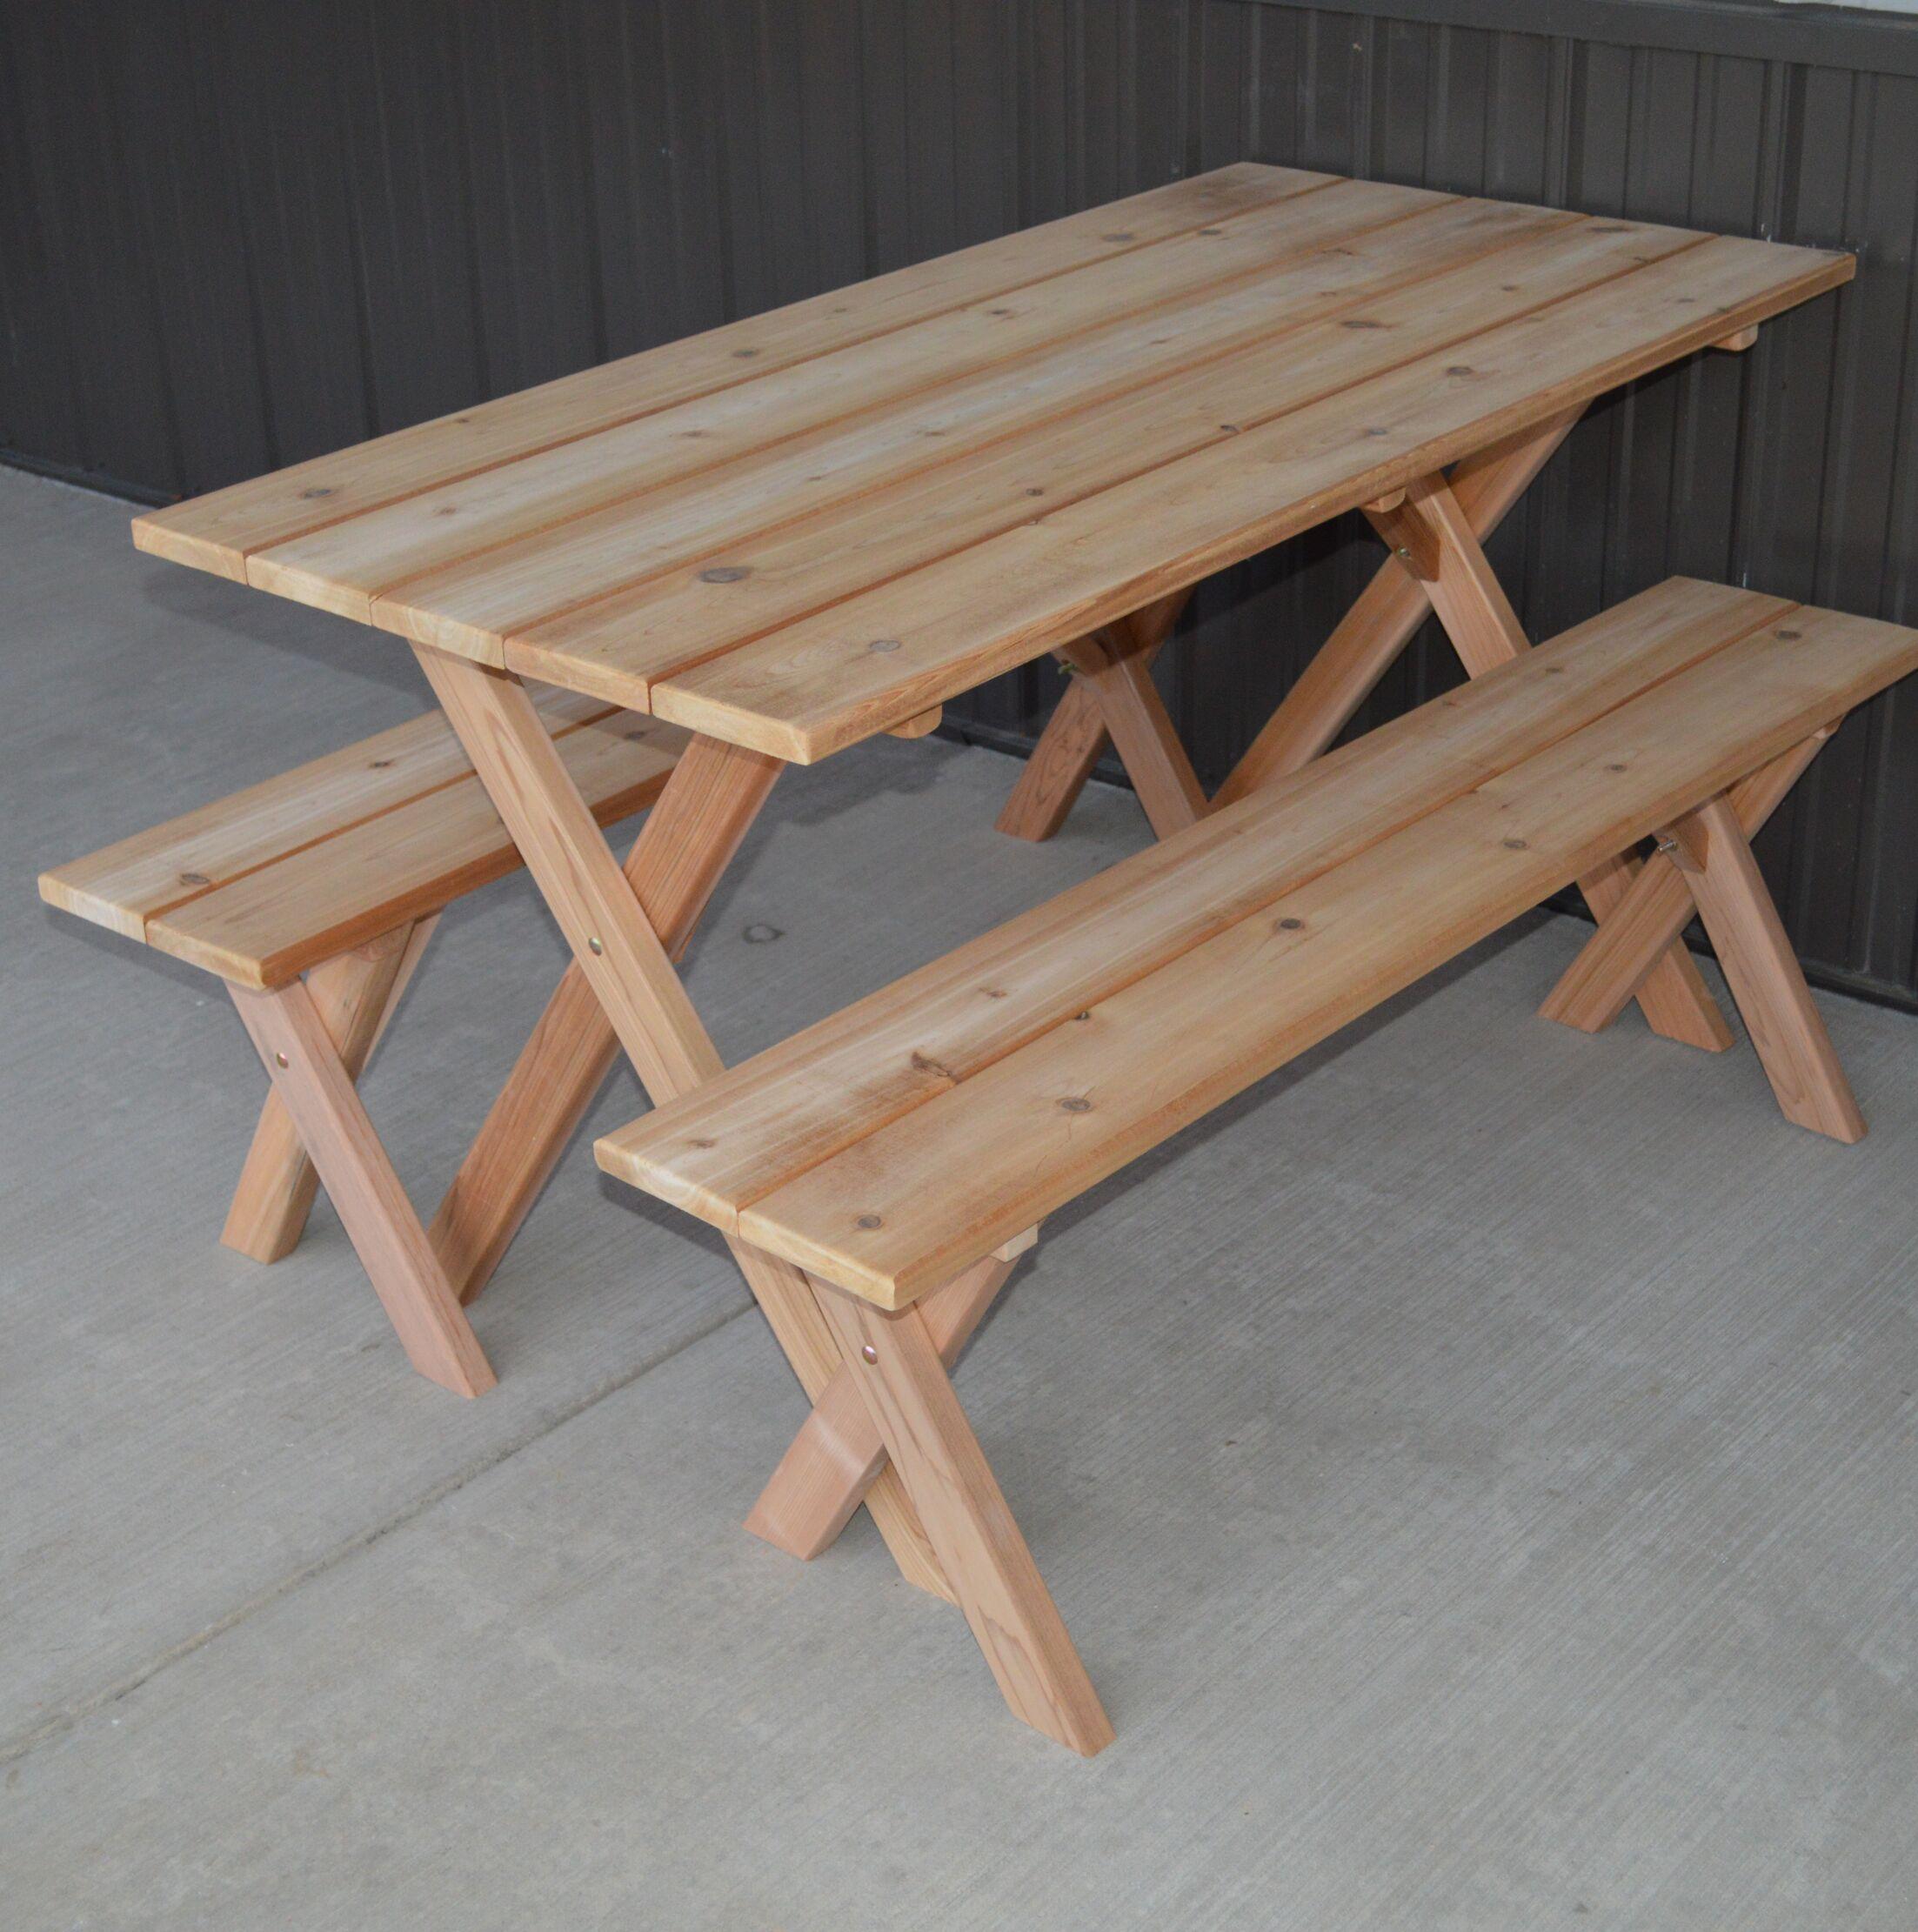 Vindas Cedar Economy Wooden Picnic Table Color: Unfinished